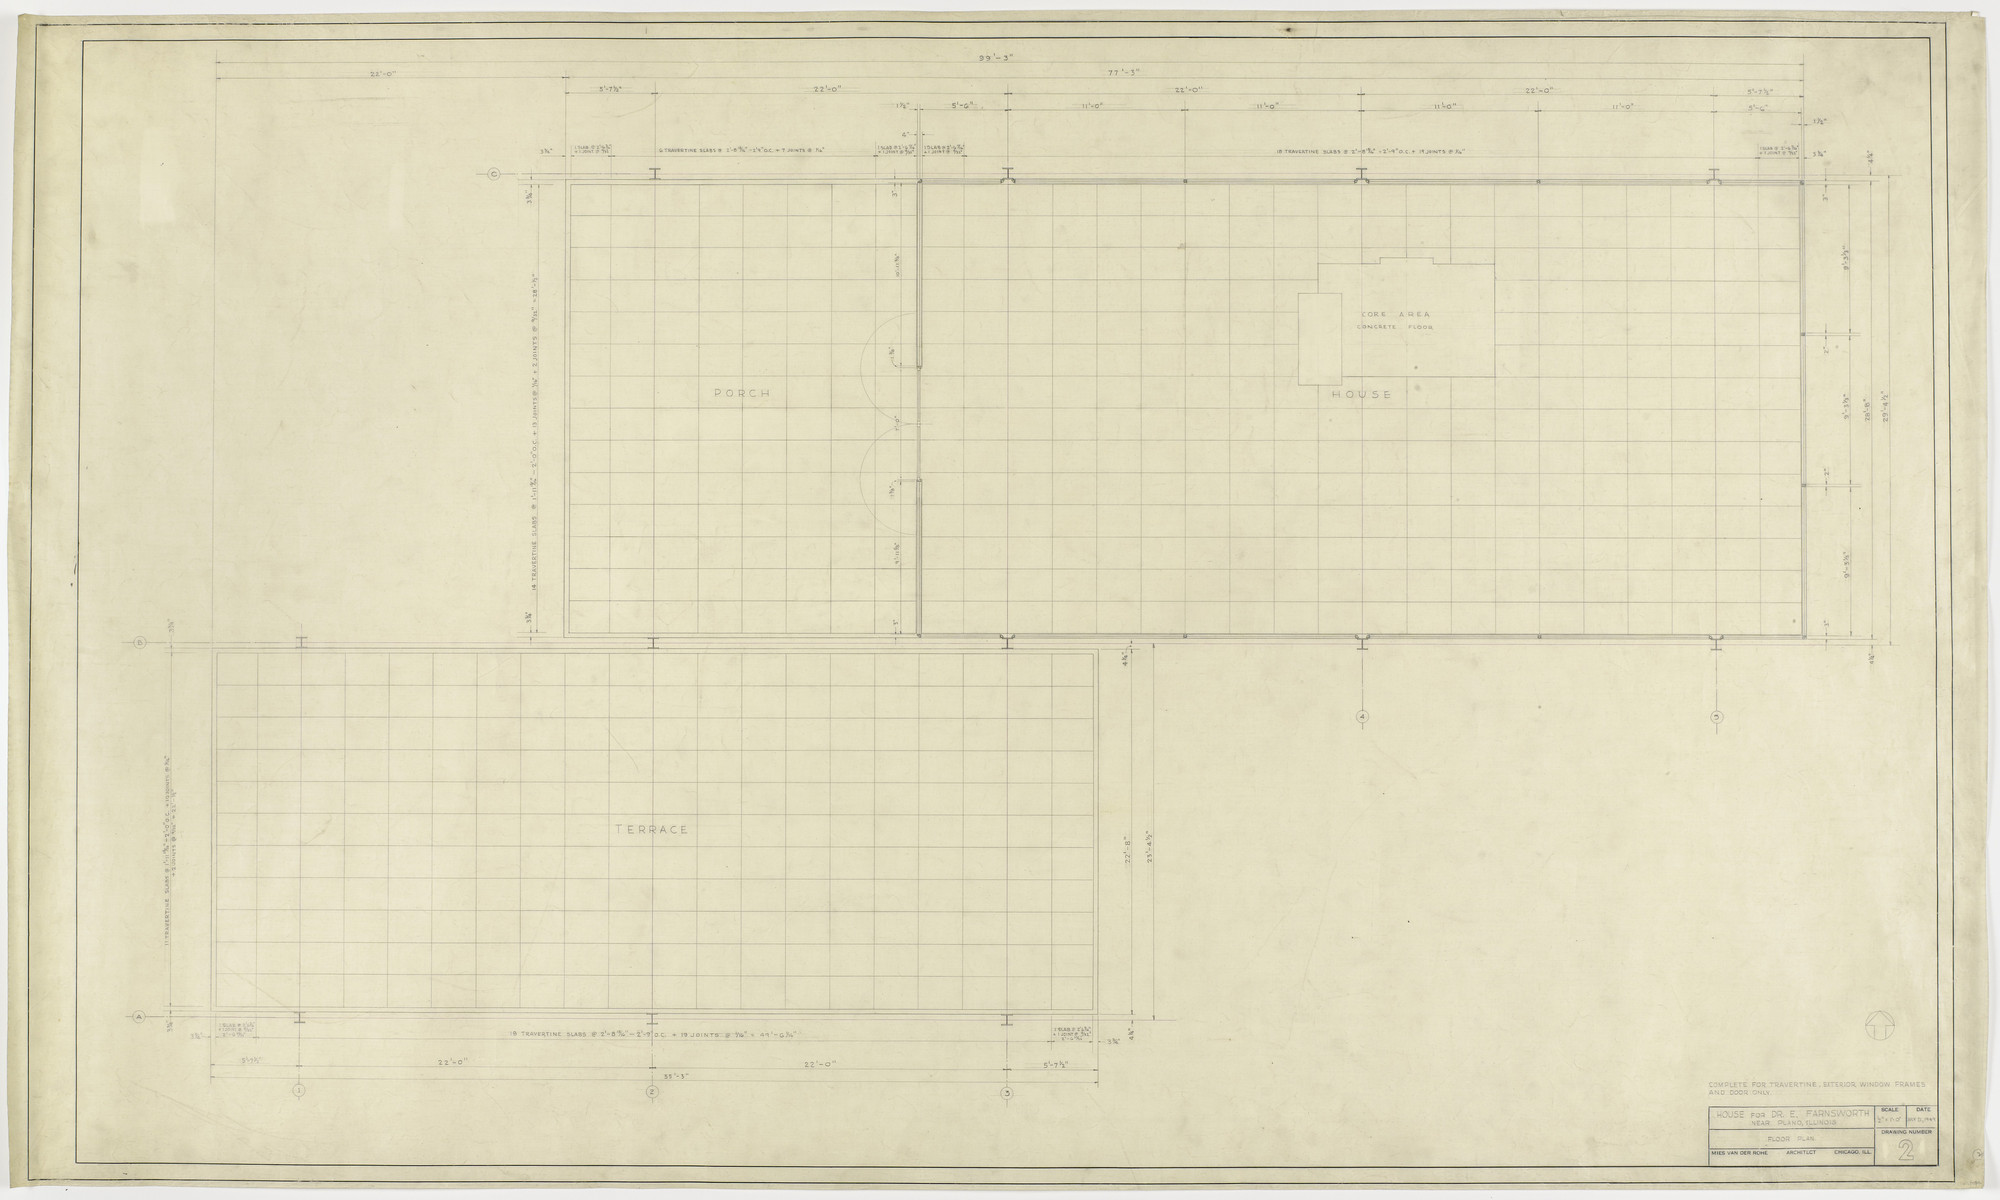 Ludwig Mies van der Rohe Farnsworth House Plano Illinois Floor